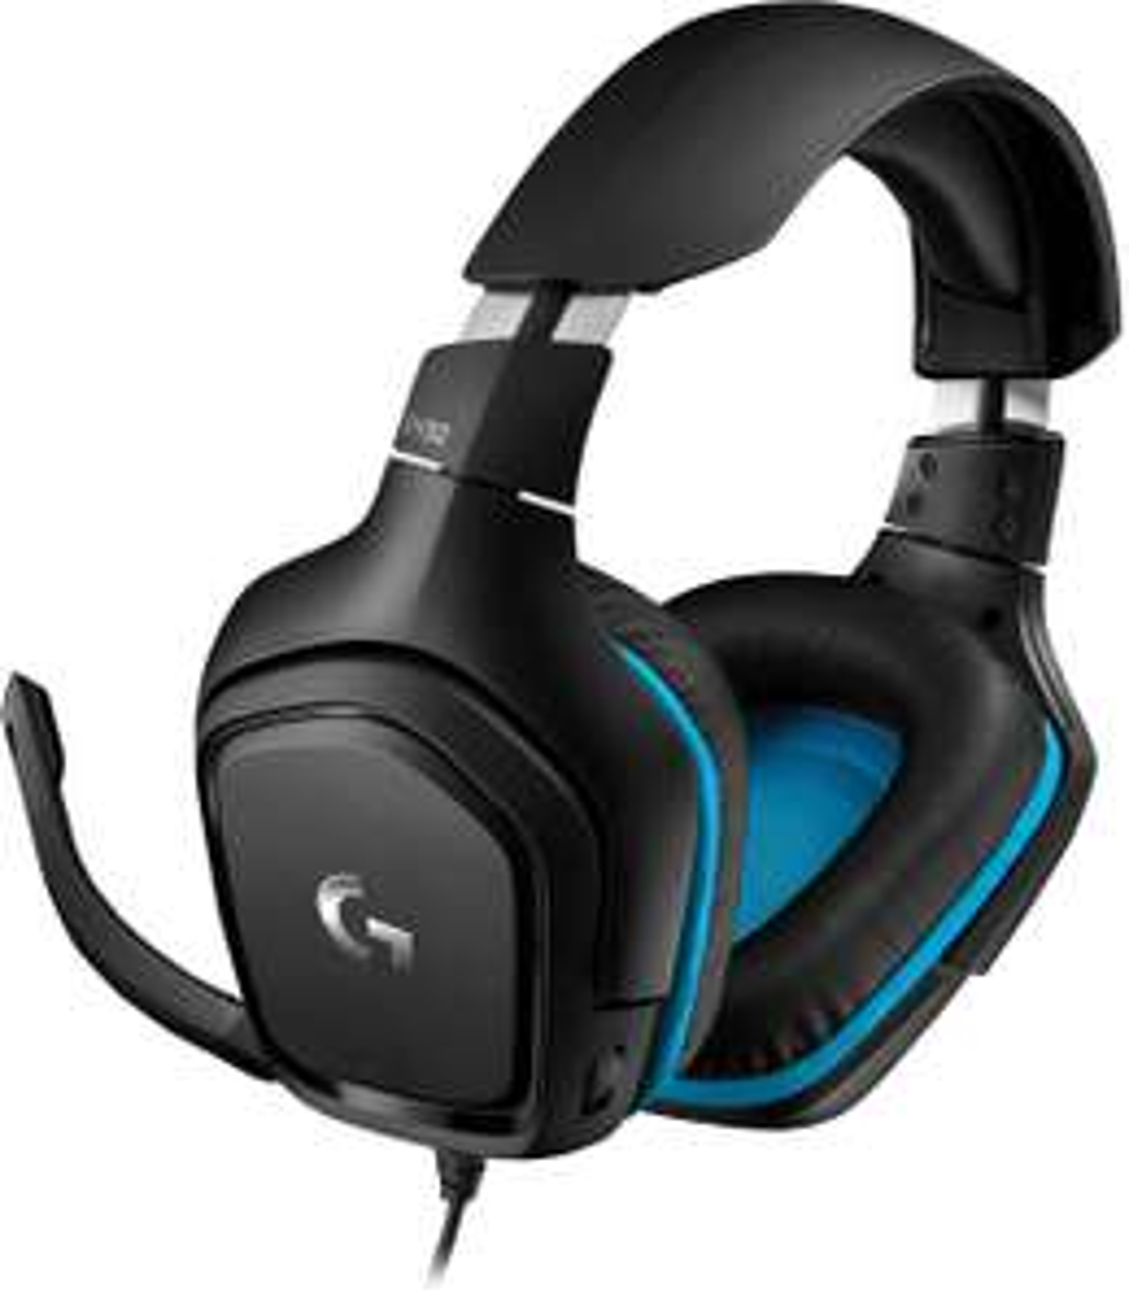 Casque audio Logitech G432 - son Surround 7.1